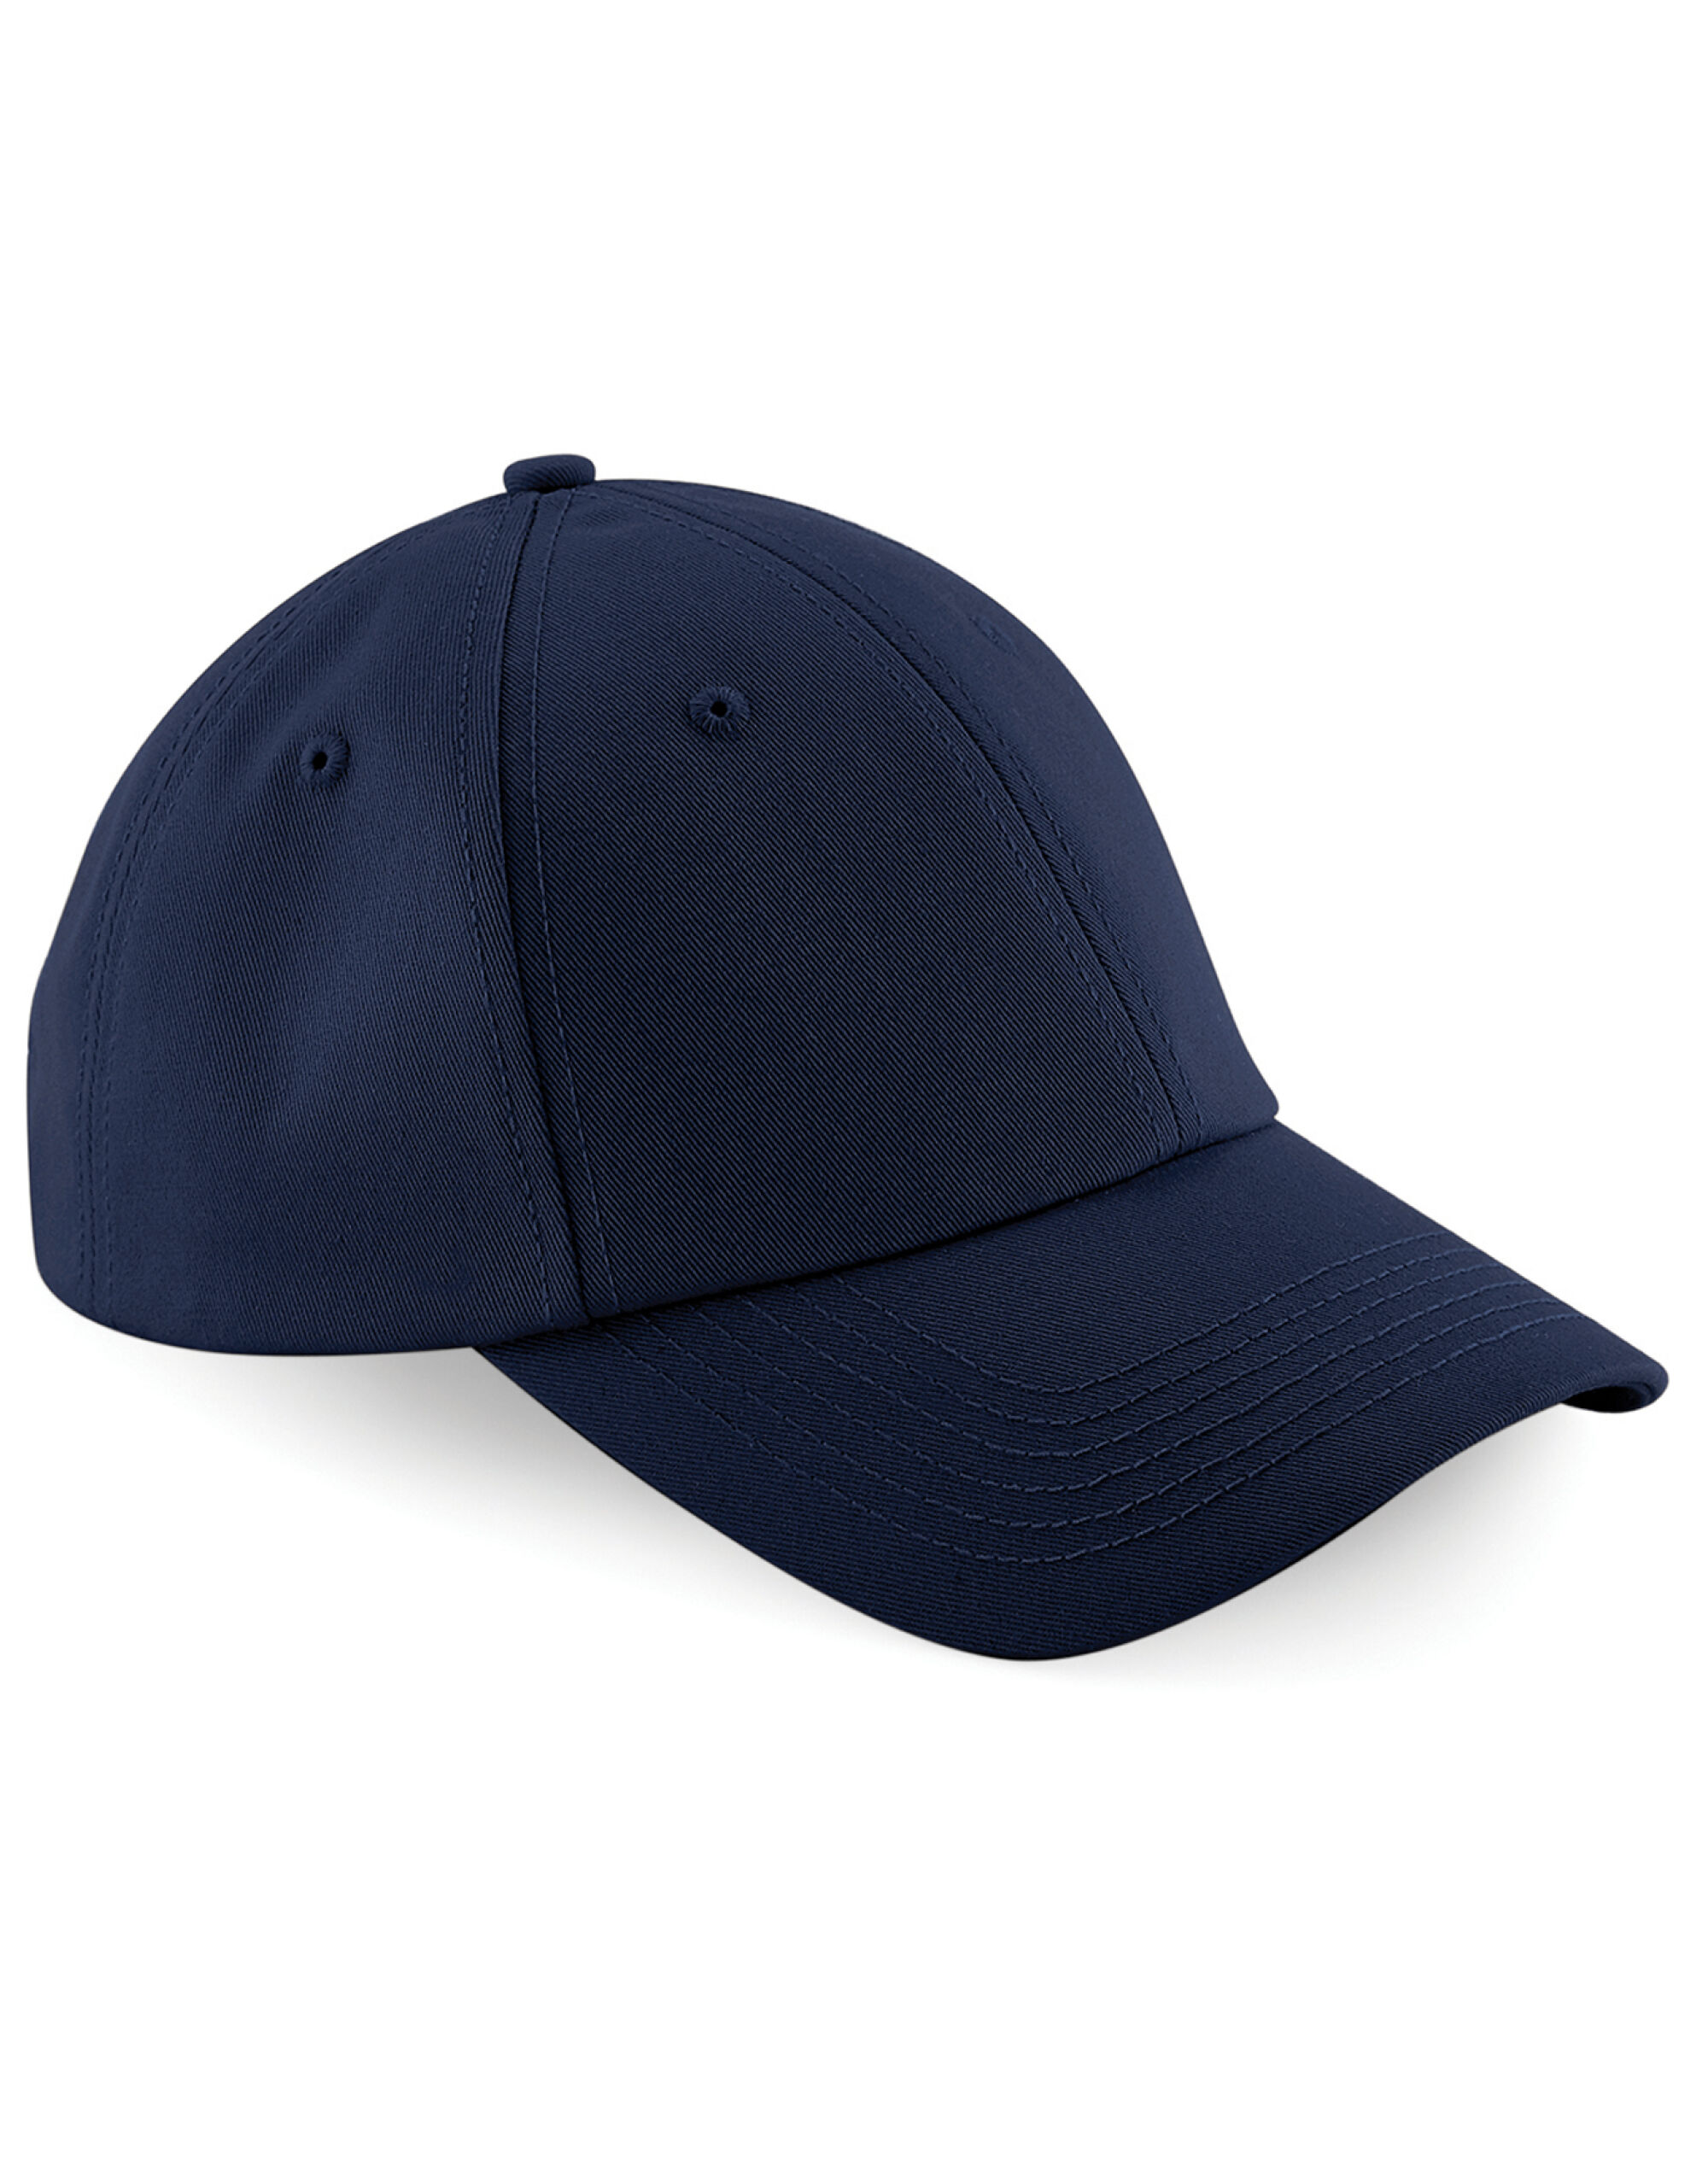 5c83c556543 Beechfield Authentic Baseball Cap Caps   Hats Etc All Sizes and ...